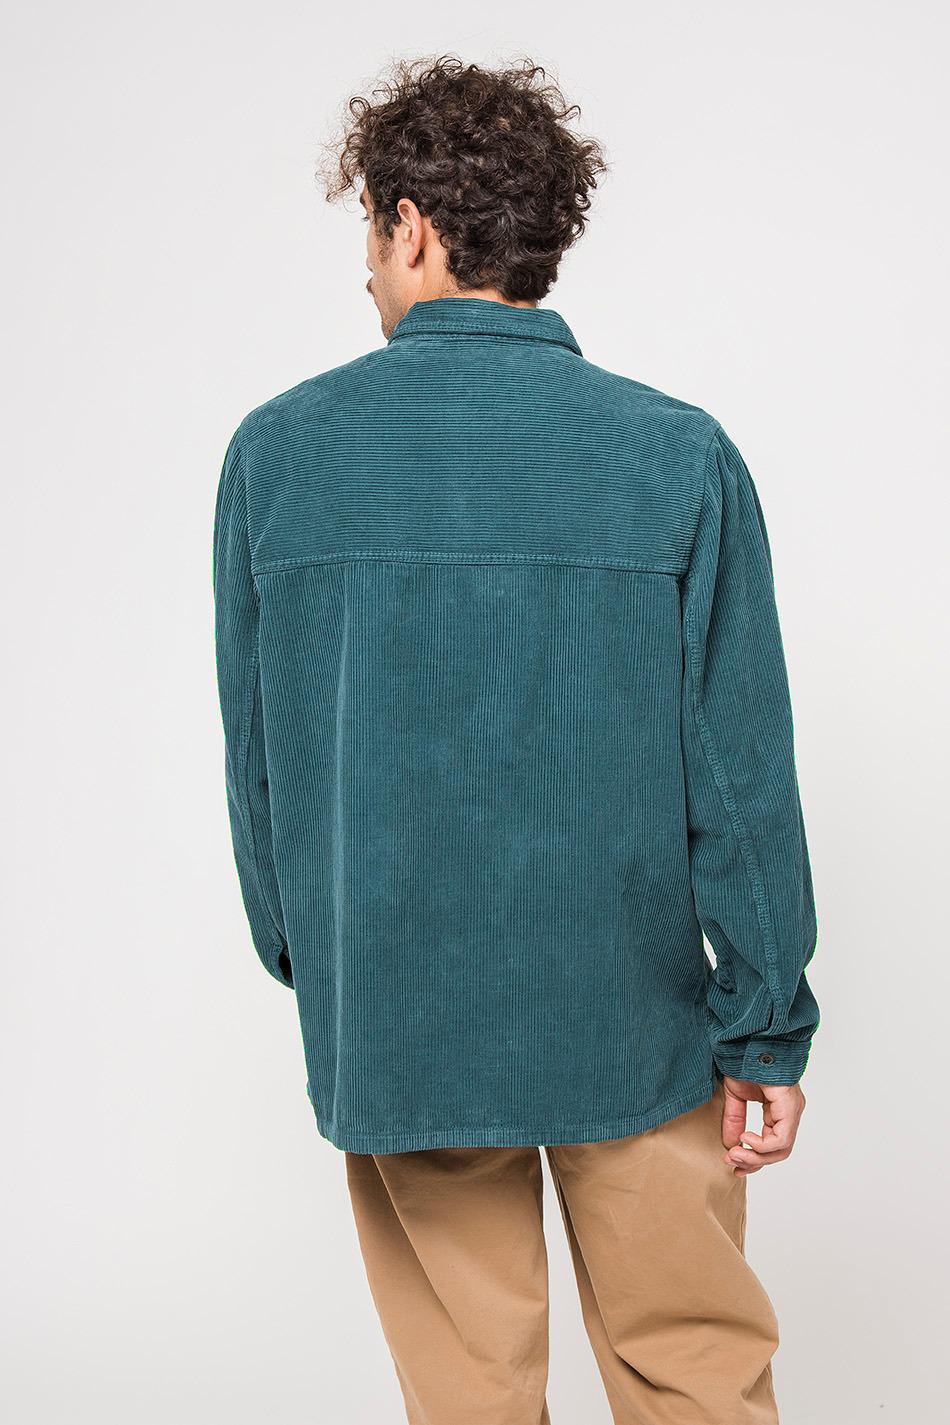 Corduroy Green Shirt